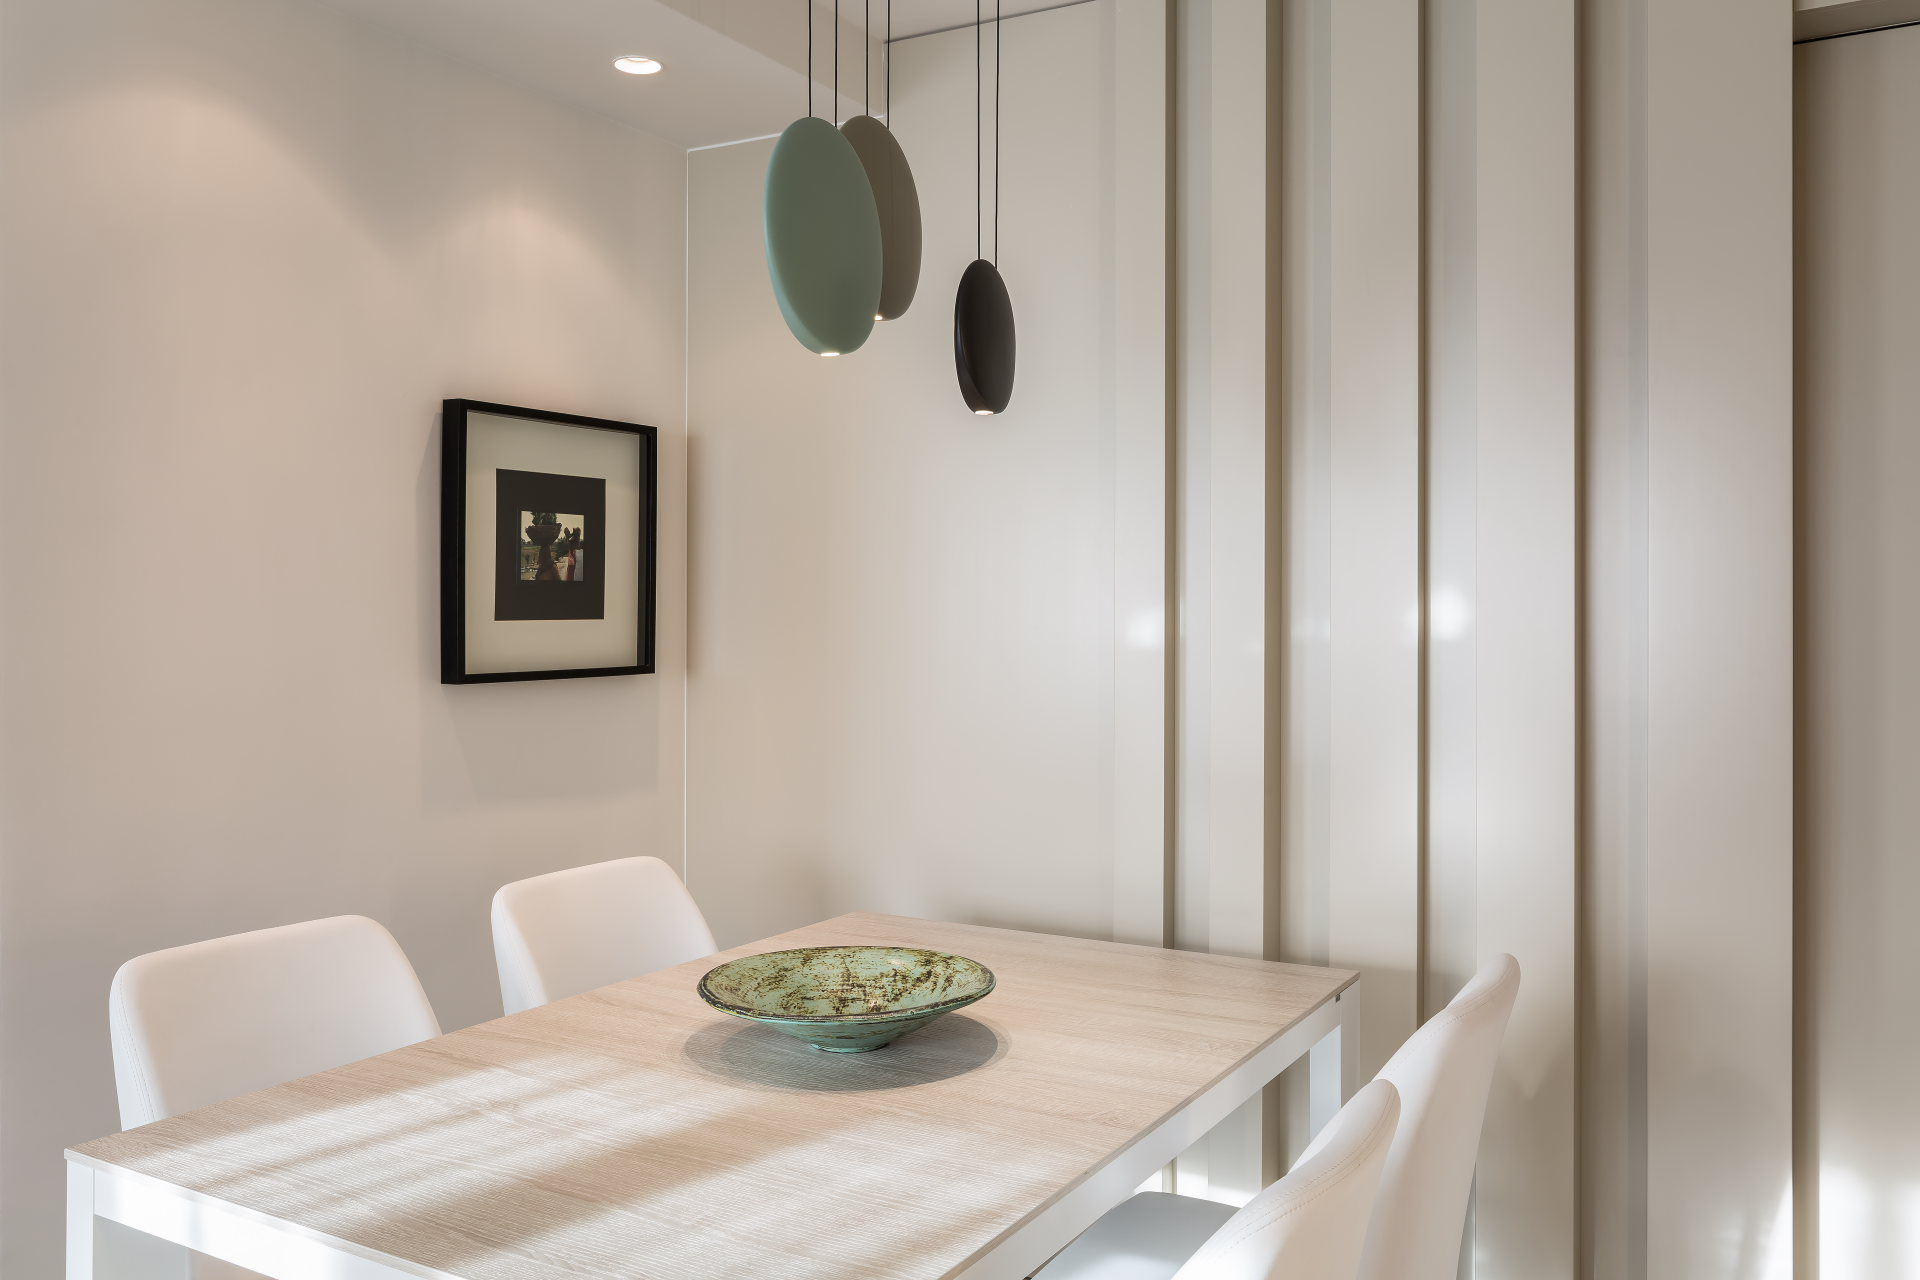 fotografia-arquitectura-interiorismo-valencia-fenollar-german-cabo-laura-yerpes  (7)